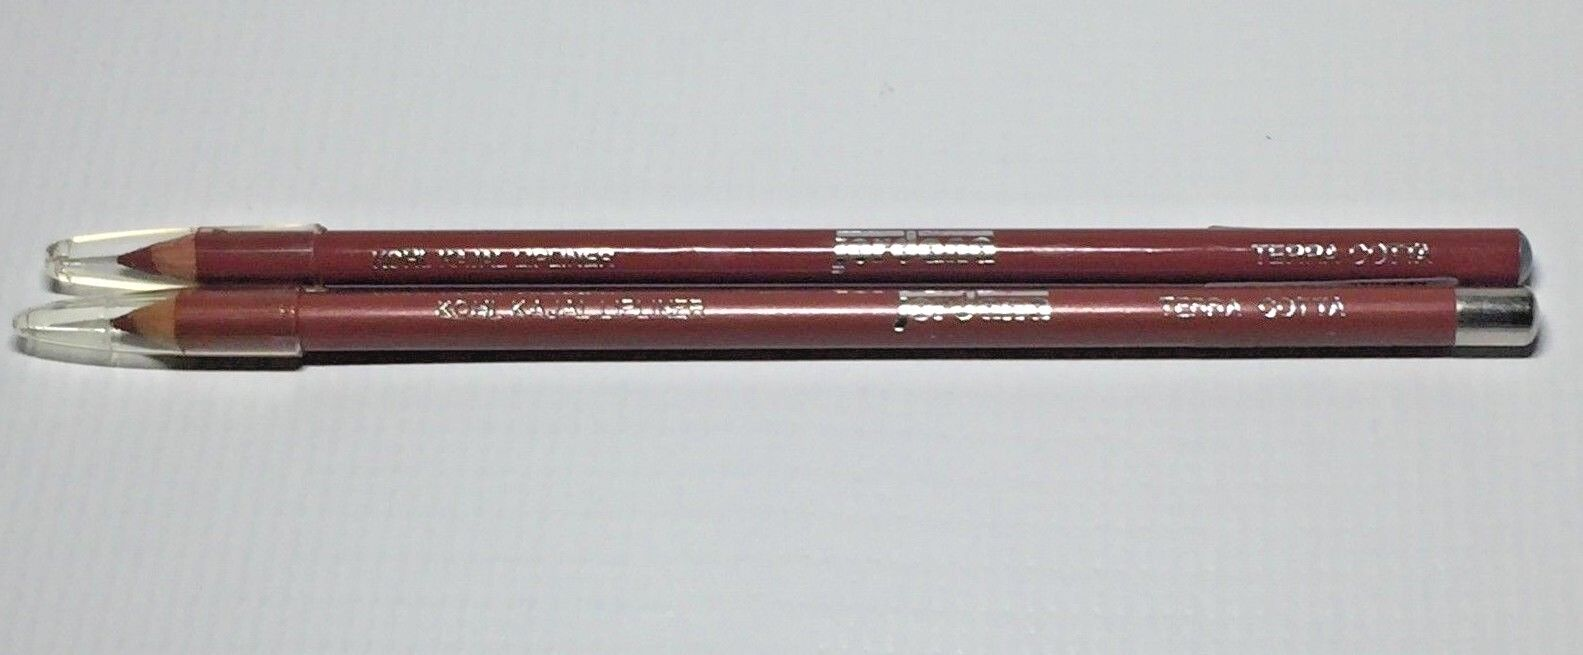 2 PACK LOT Jordana Kohl Kajal Lip Liner pencil .048 Oz TERRA